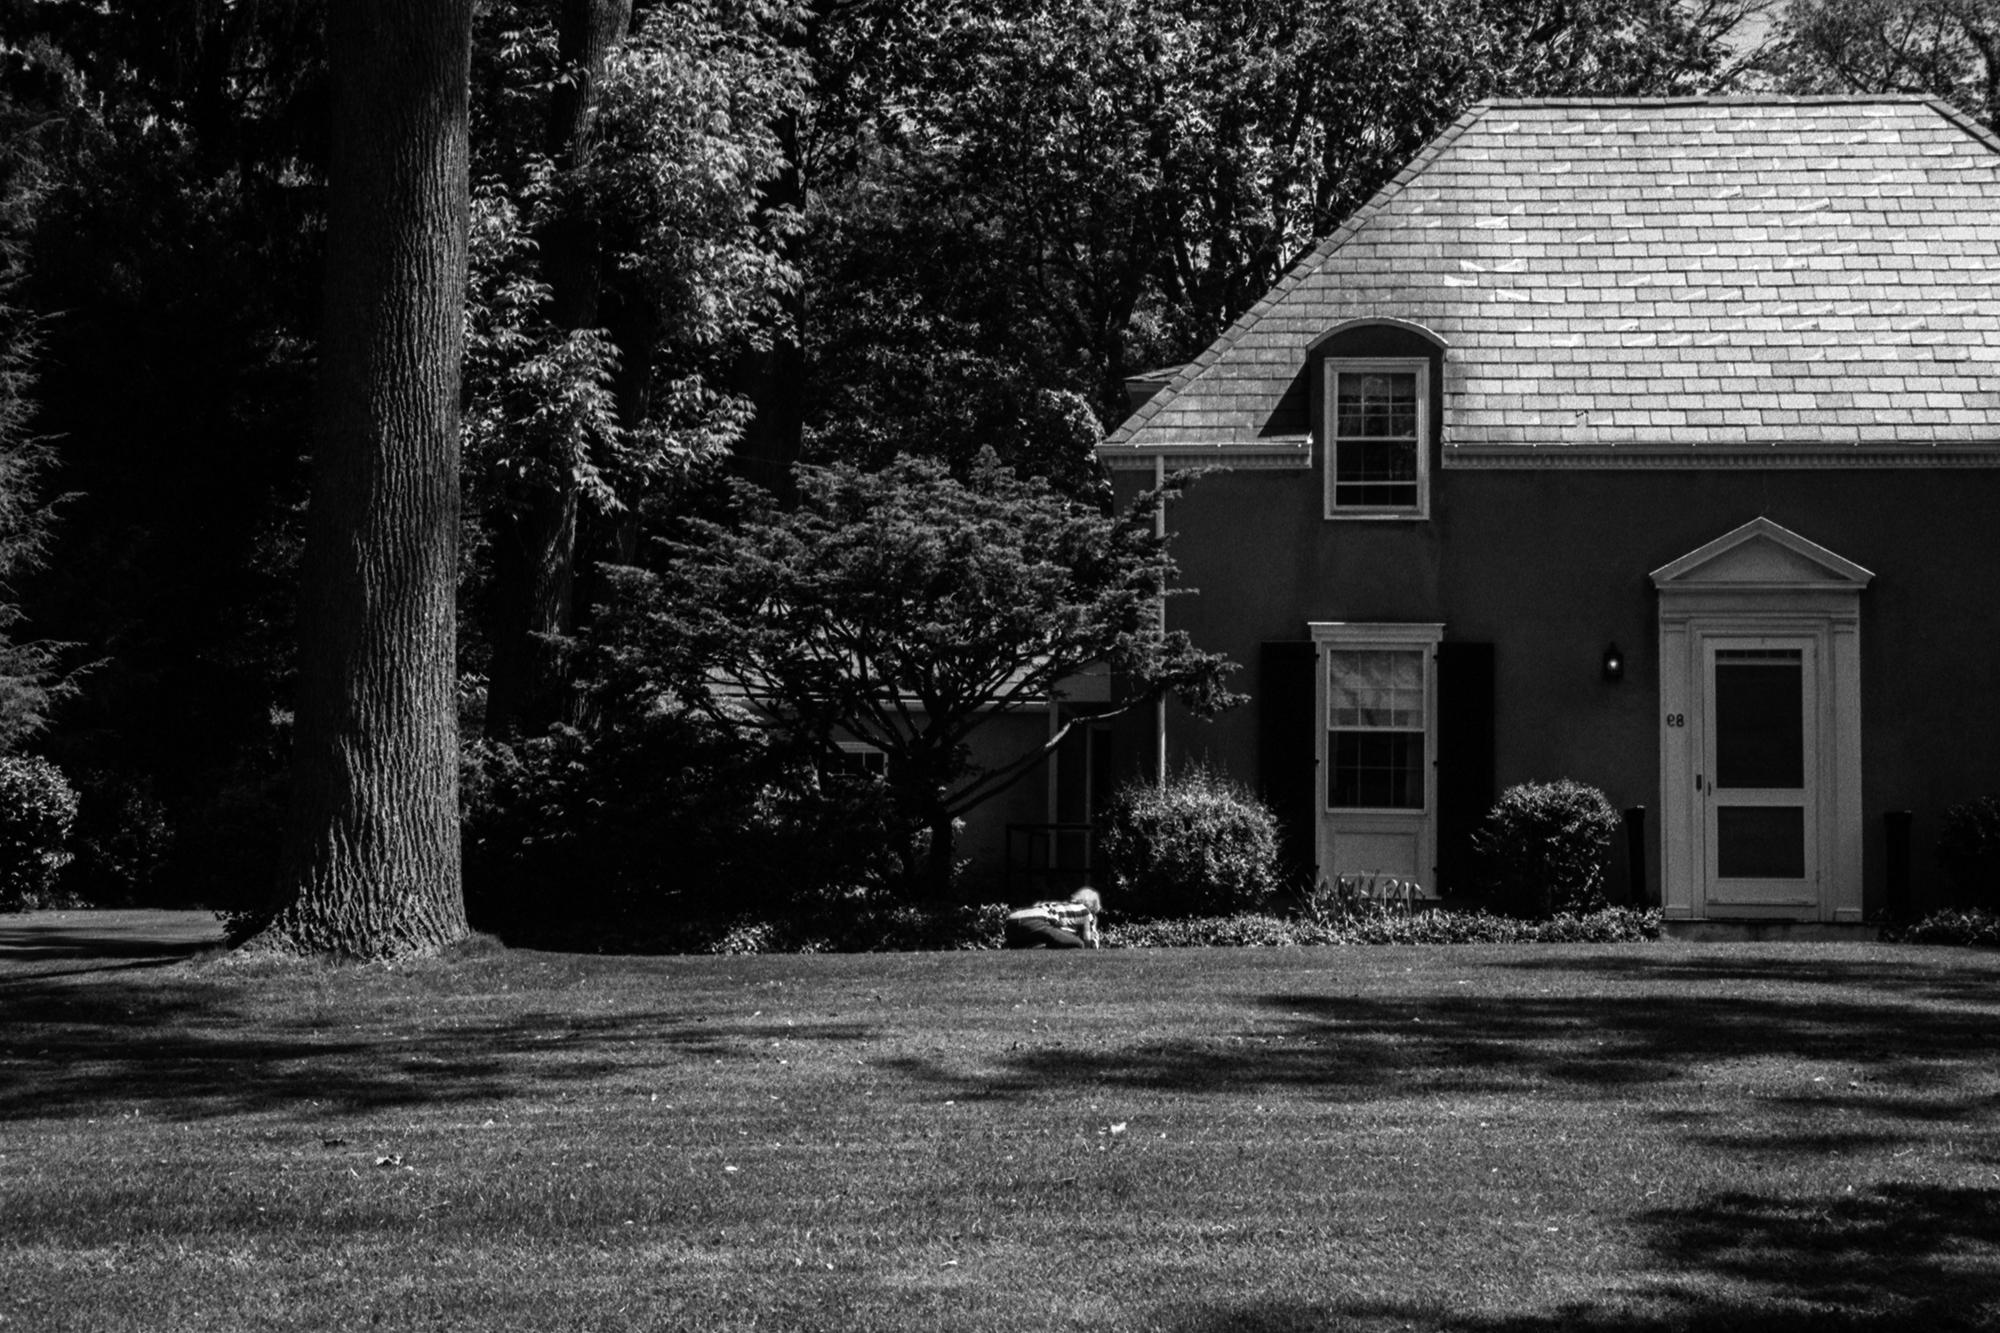 2017.07.01 35mm Princeton 050 web.jpg